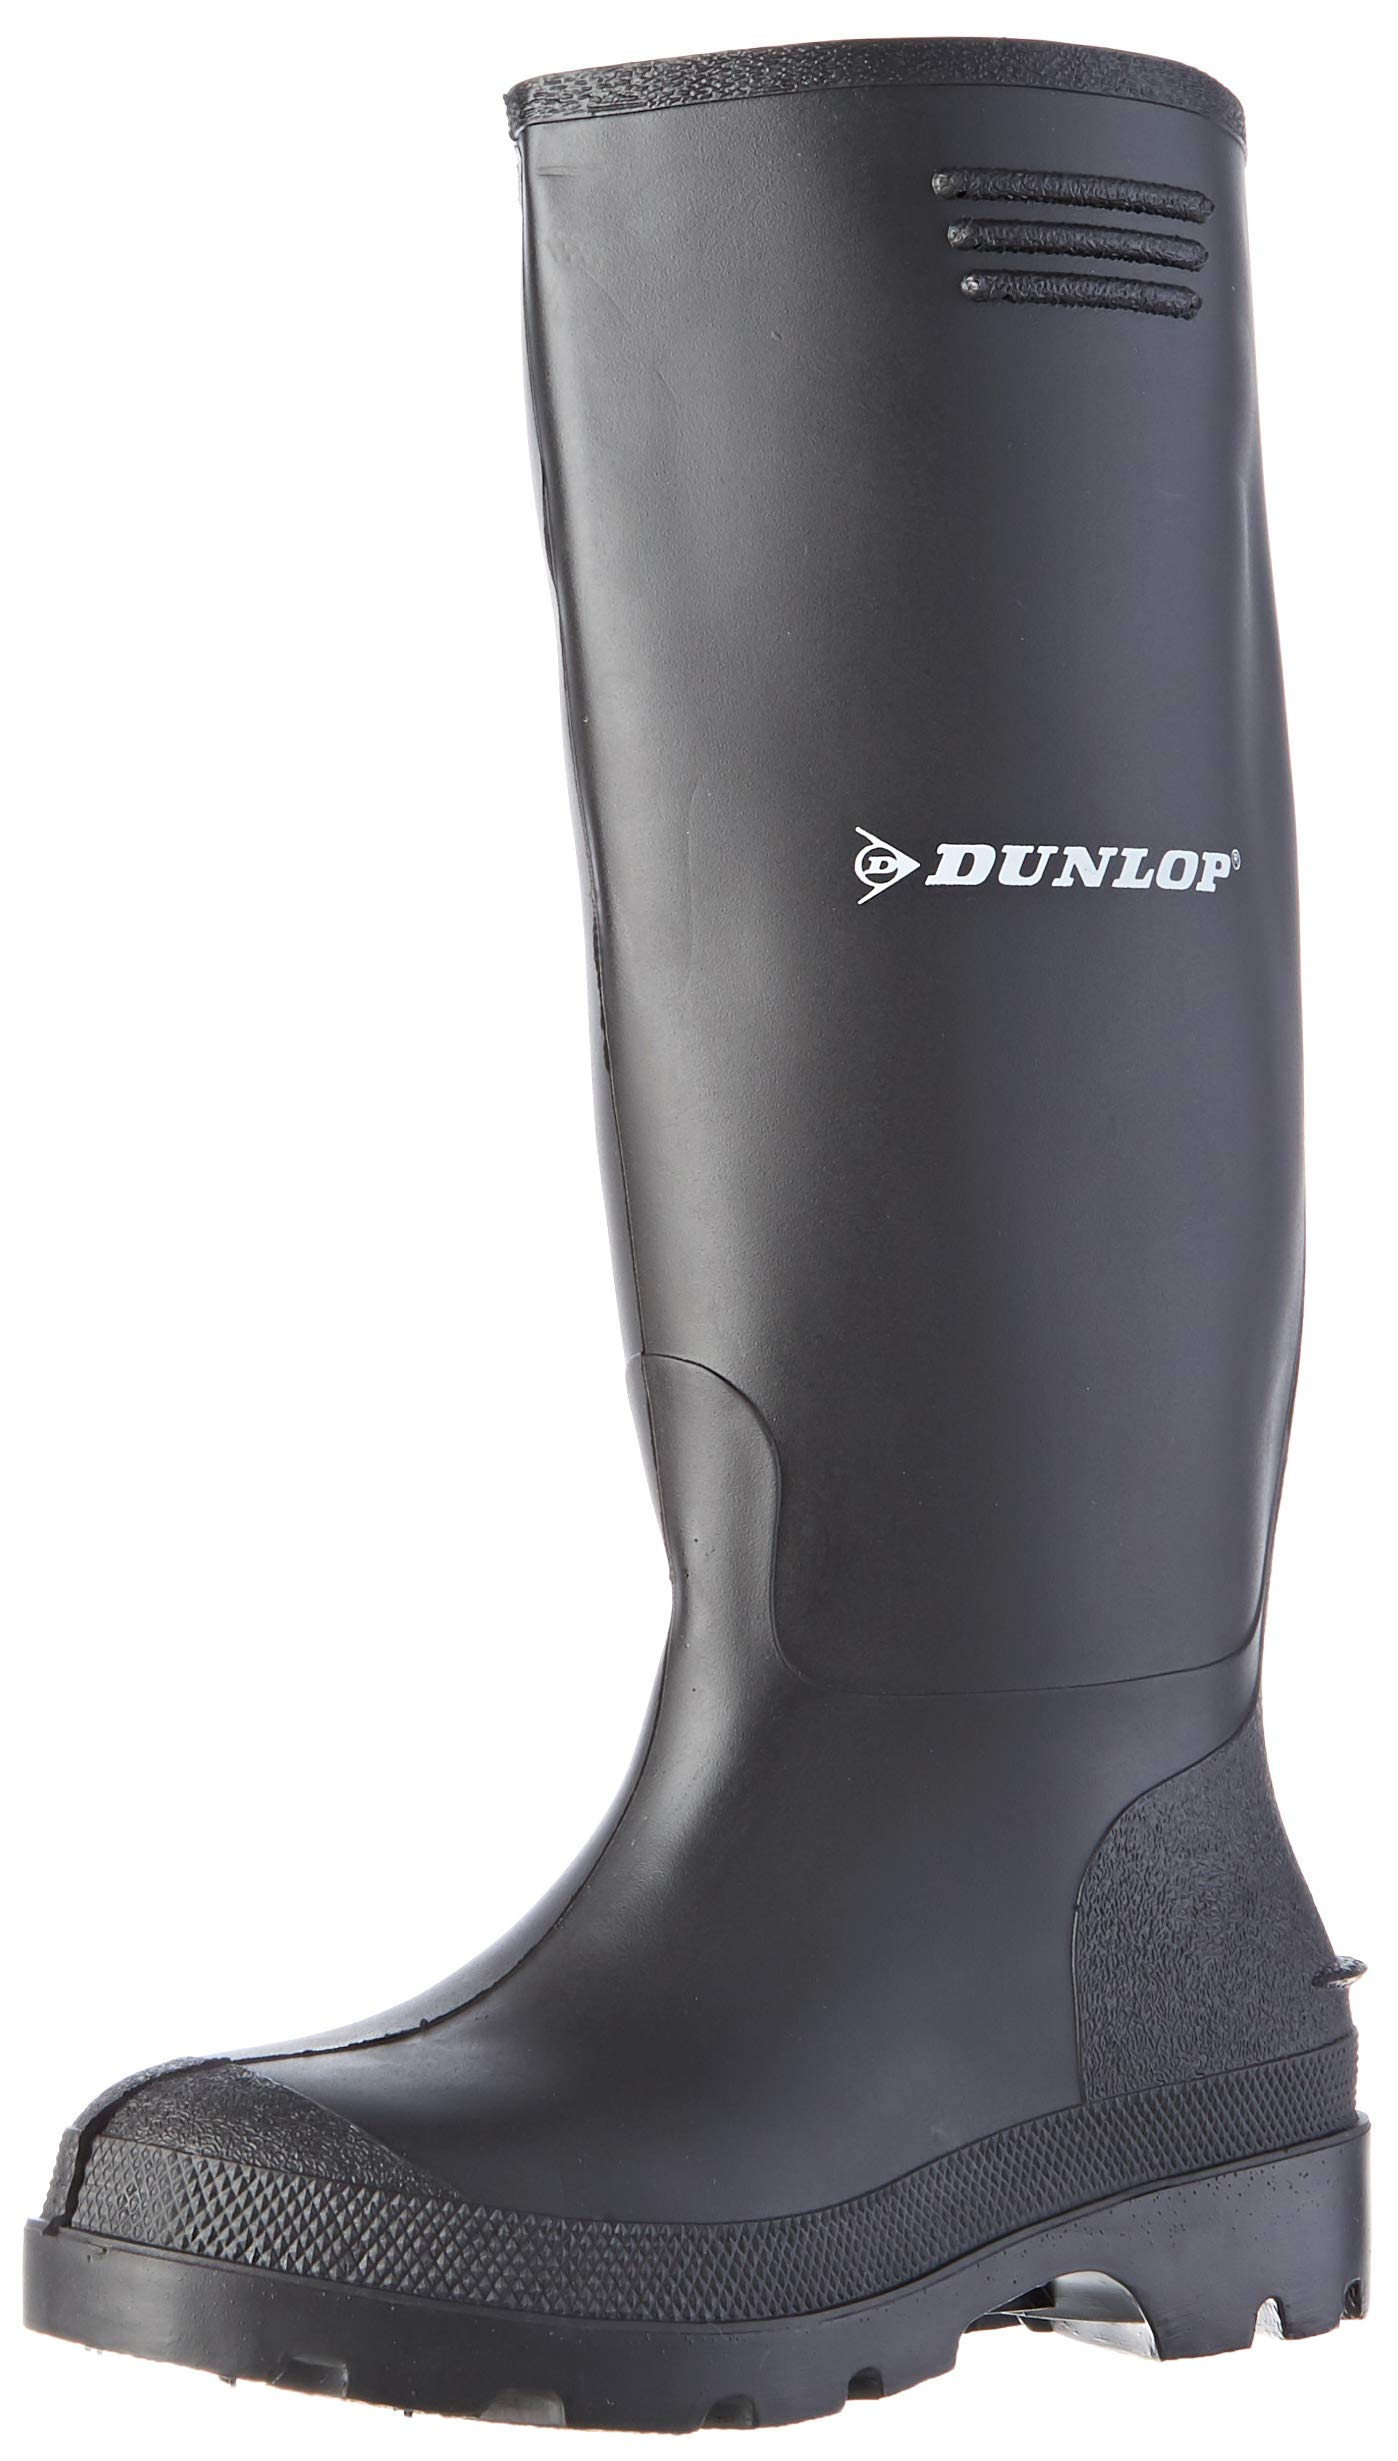 Dunlop Protective Footwear Pricemastor, Unisex Adults' Wellington Boots, Black, Size 7 UK (41 EU) 1